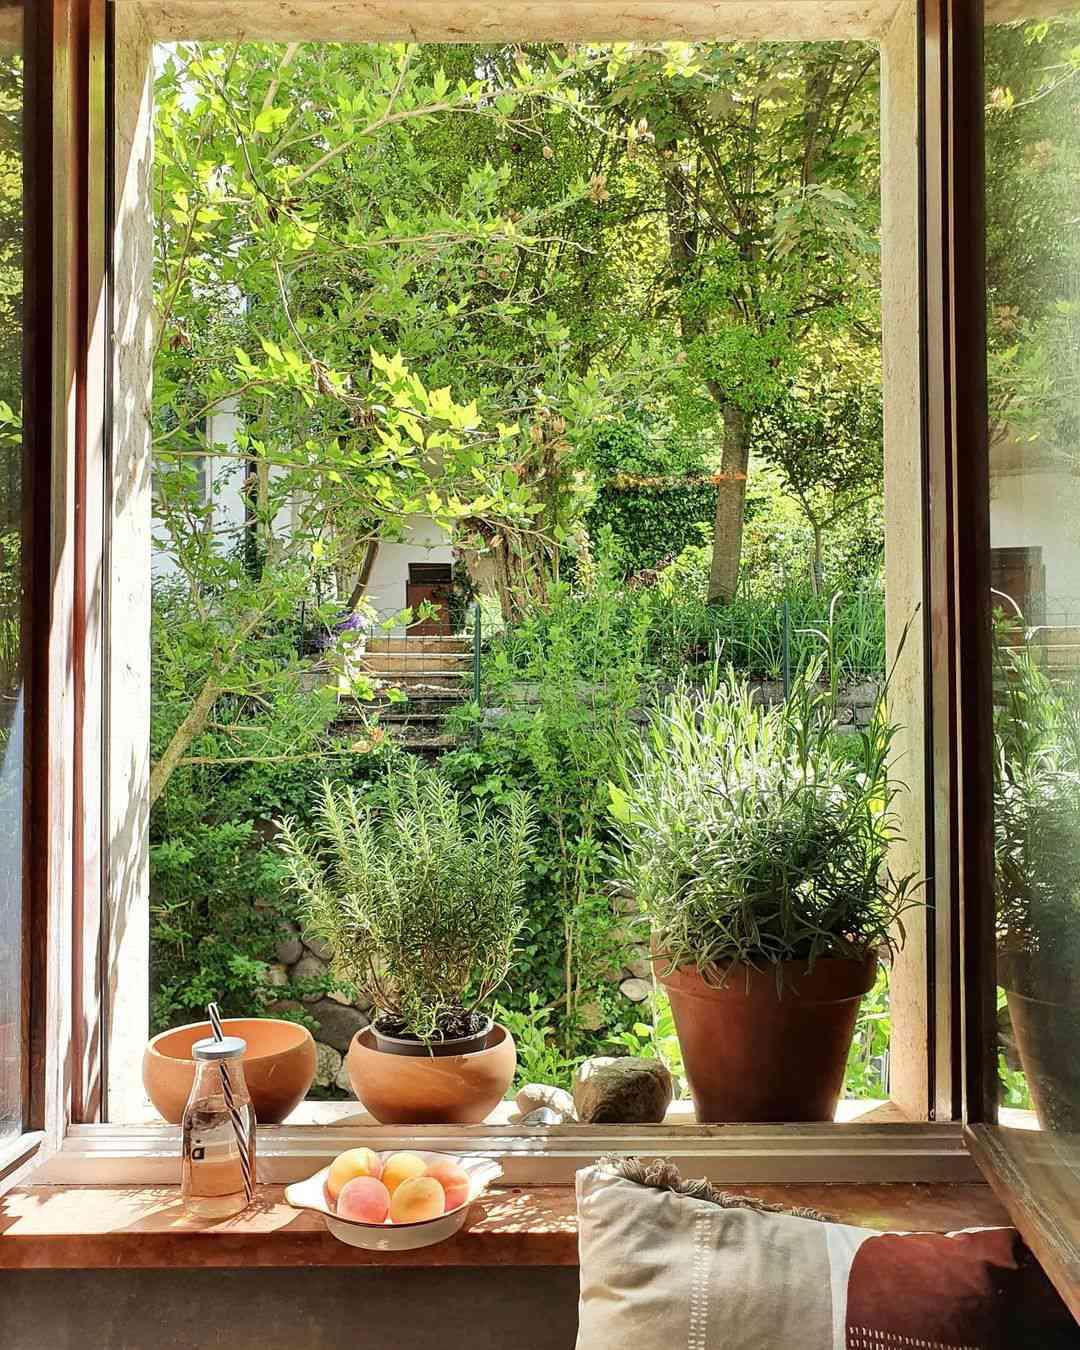 Herb garden on windowsill.